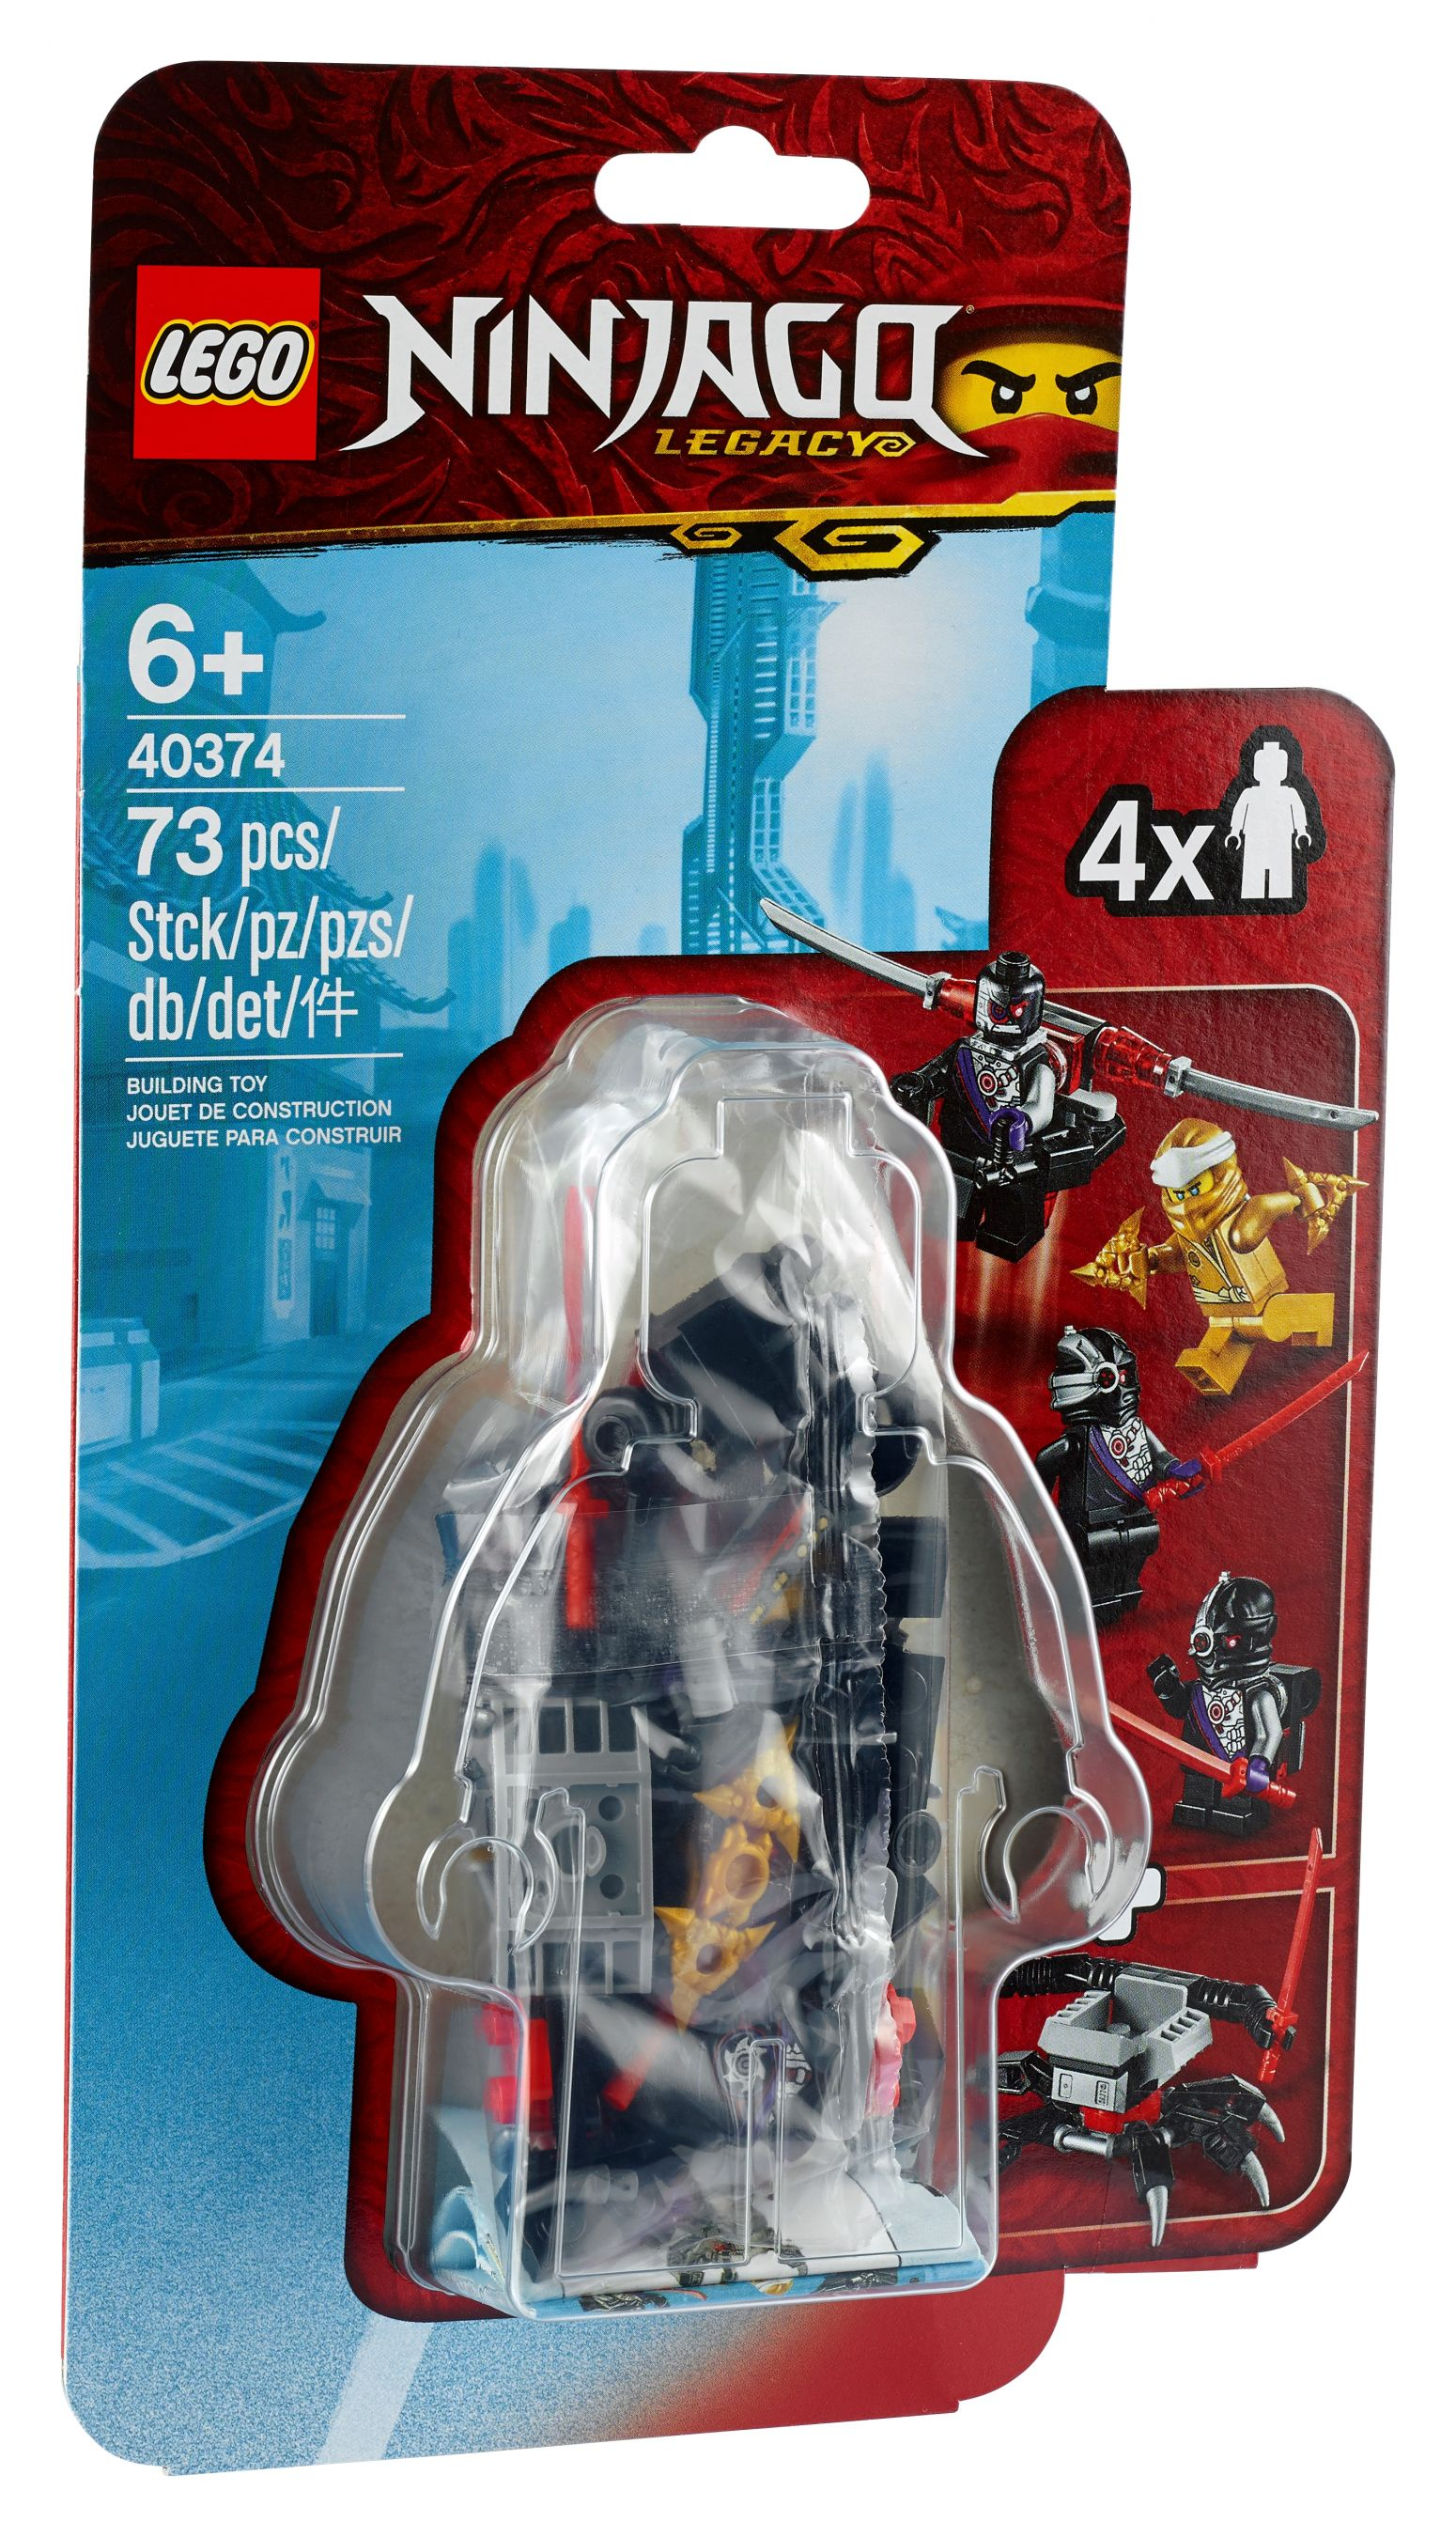 "LEGO® Ninjago 40374 Goldener Zane -"" Minifiguren-Zubehörset"